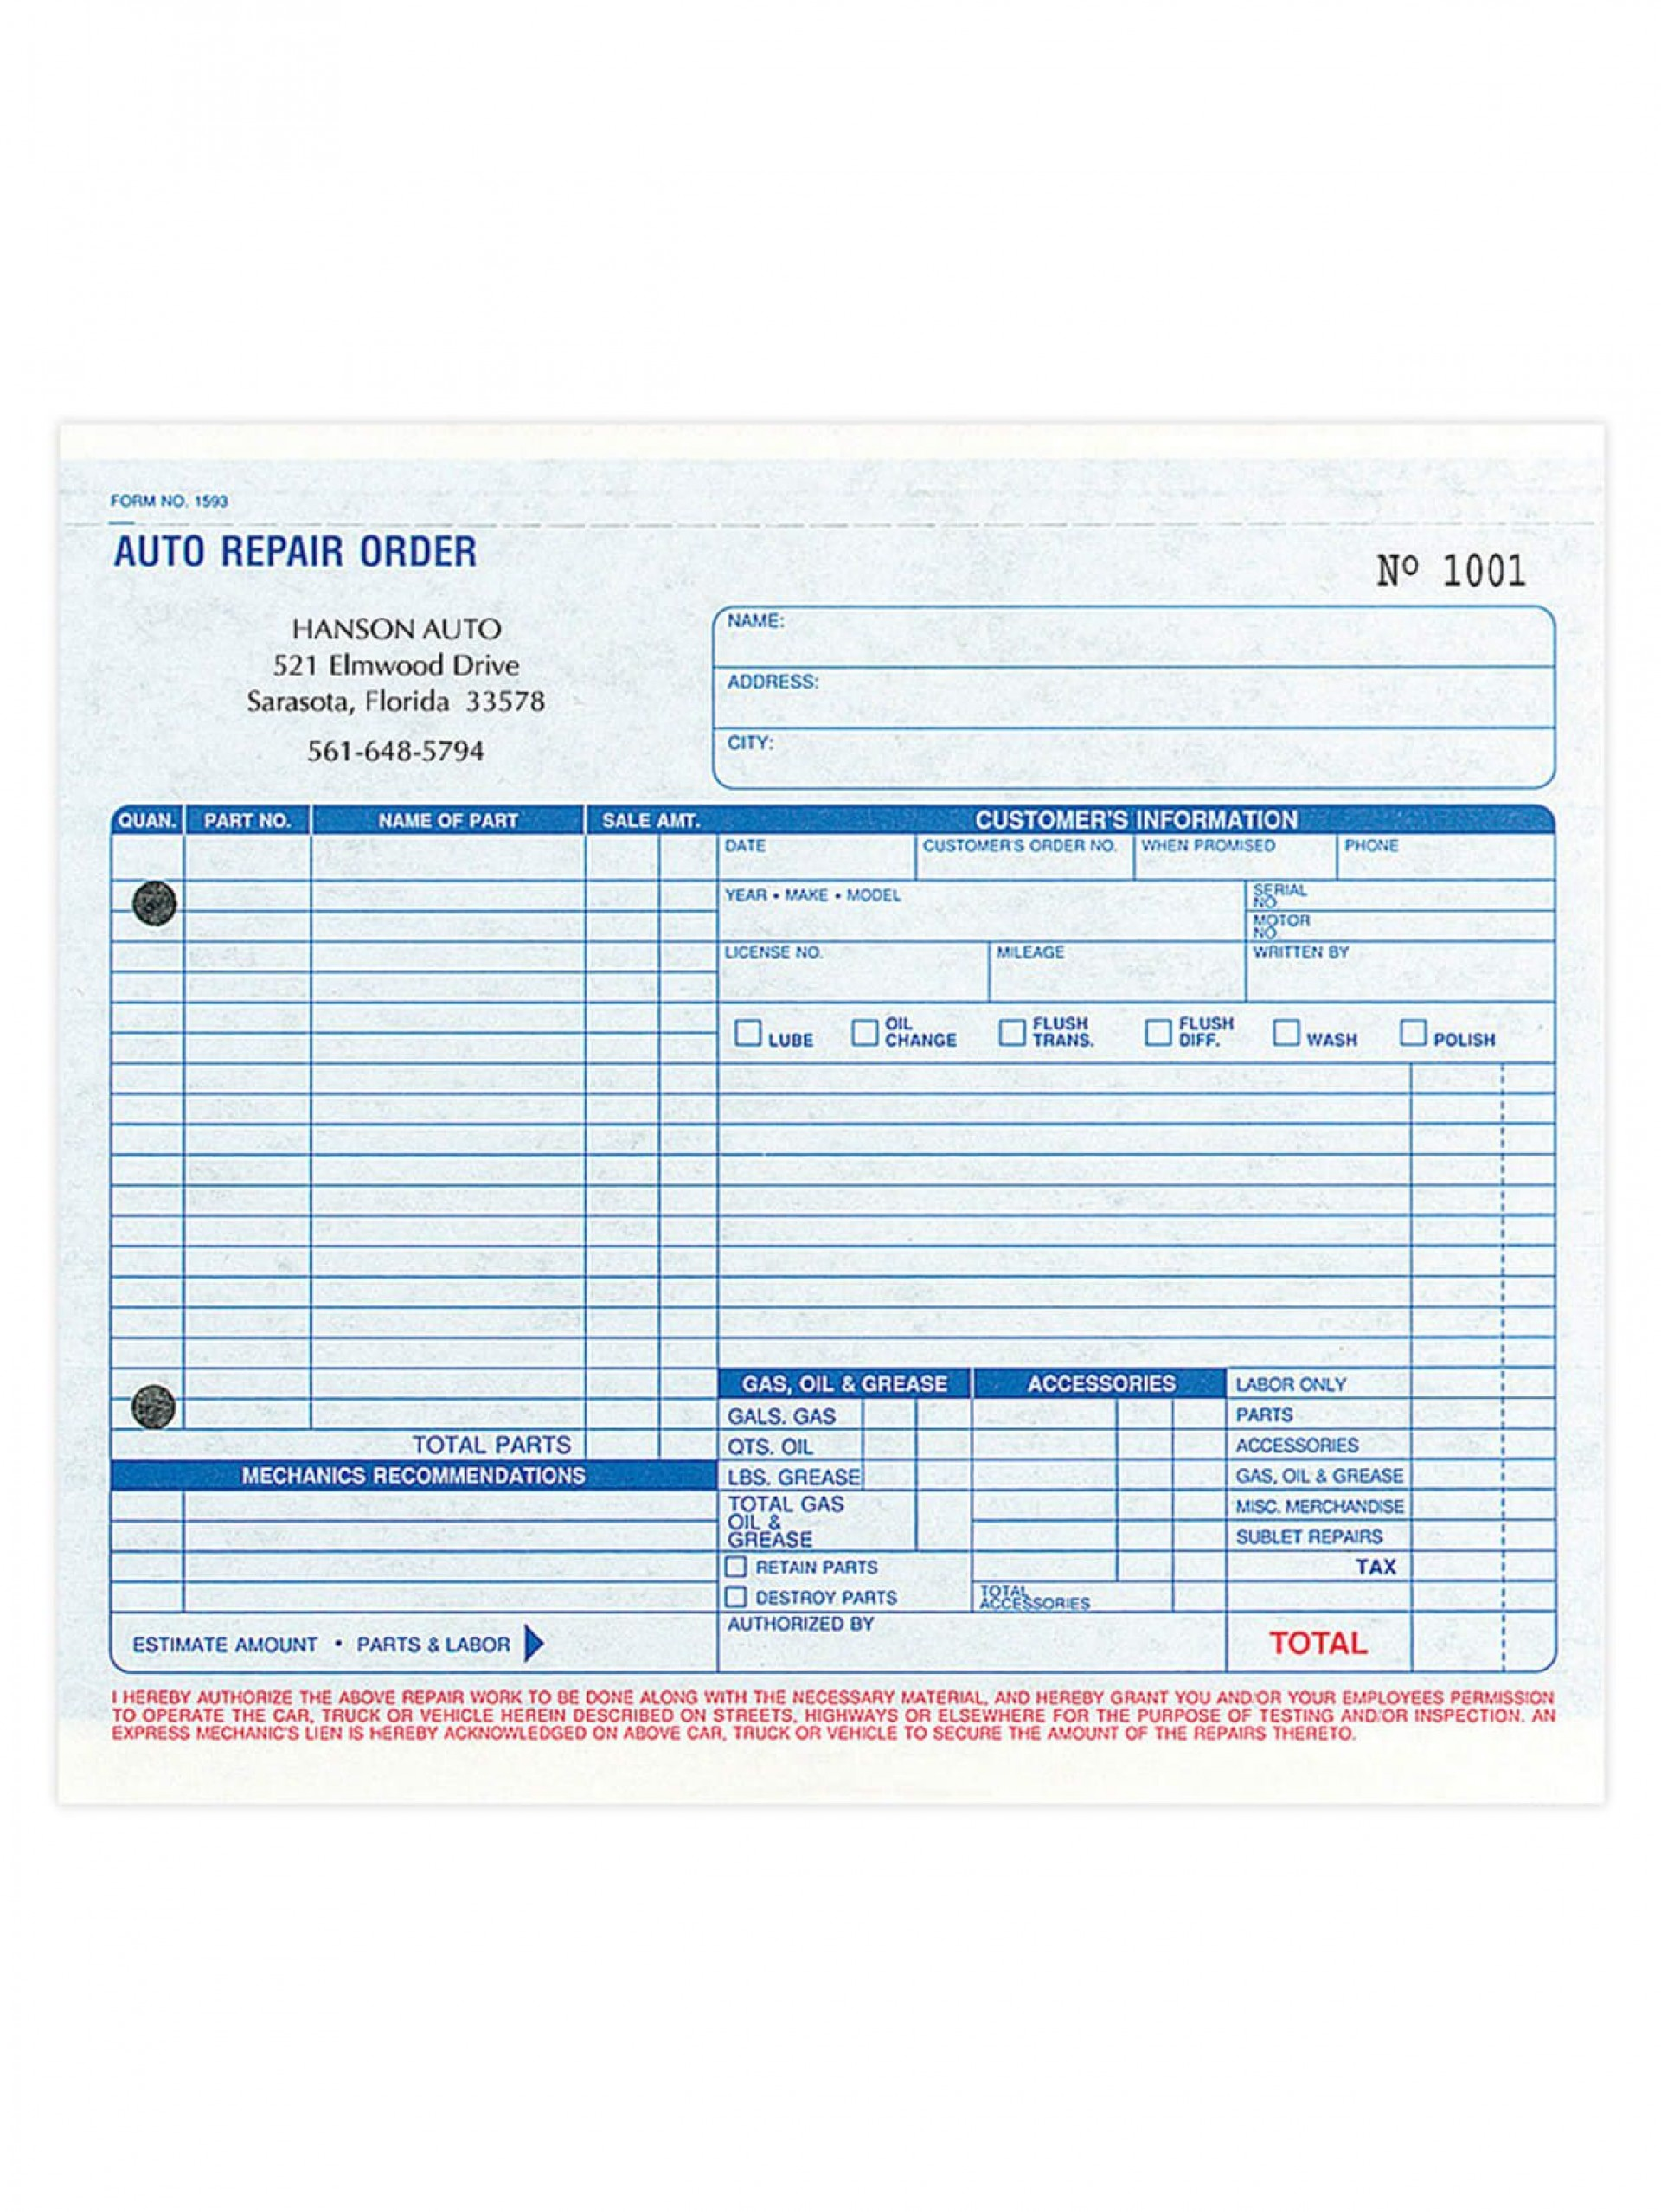 004 Amazing Auto Repair Work Order Template Excel Free Example 1920